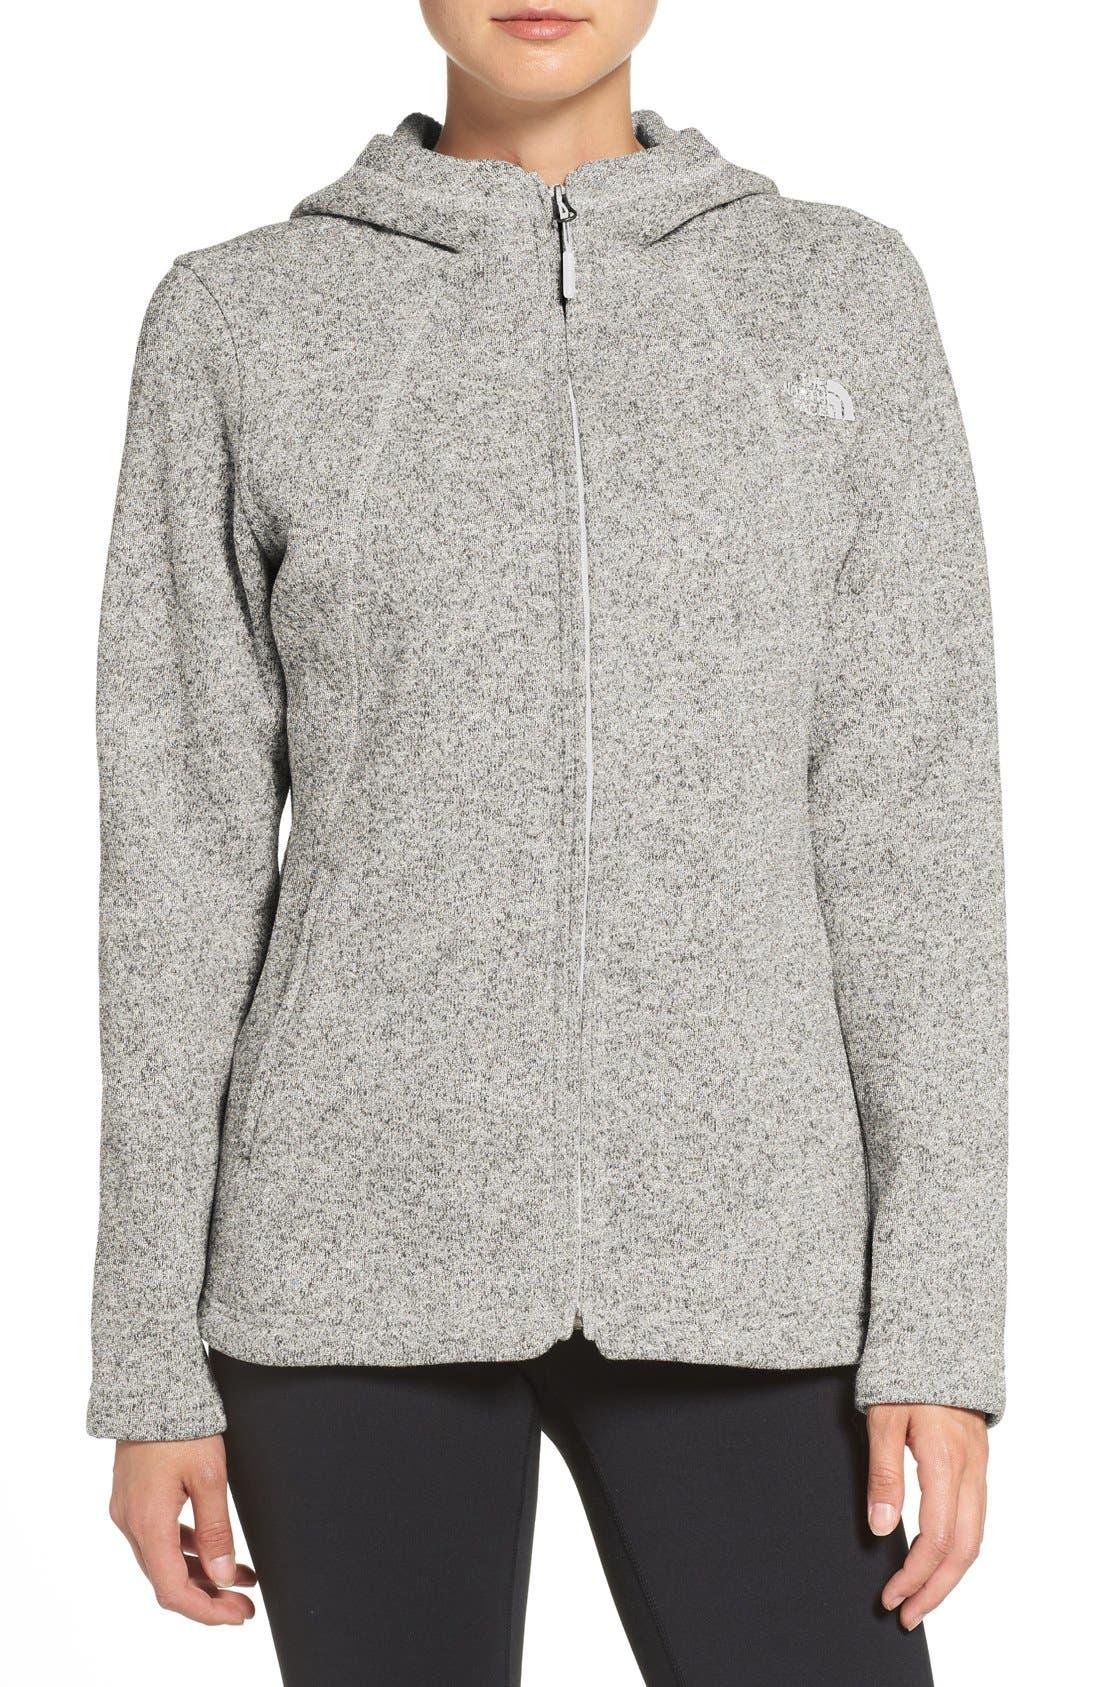 'Crescent' Fleece Jacket,                             Main thumbnail 4, color,